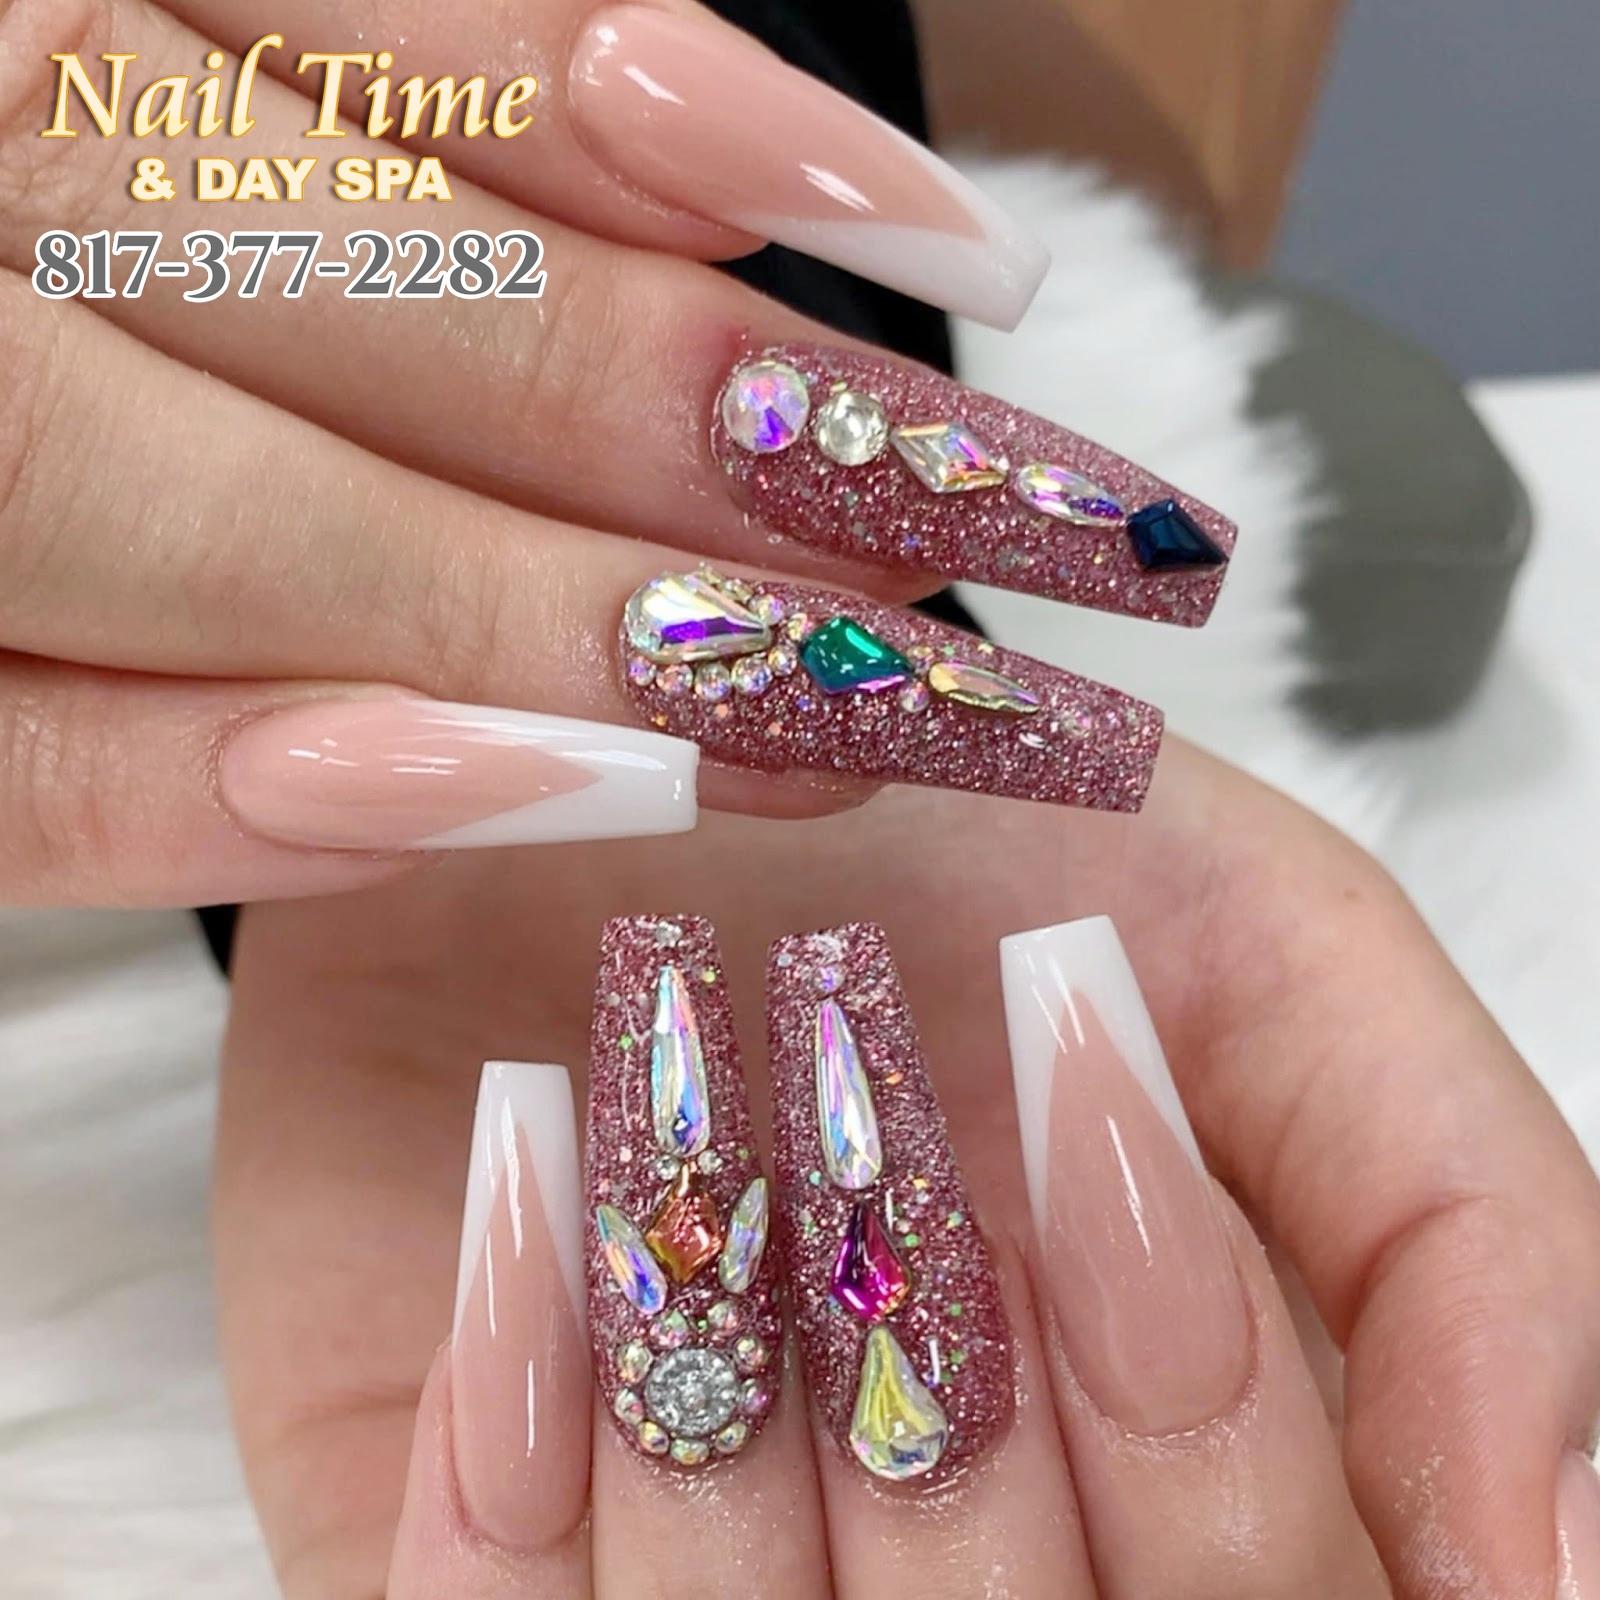 Nail Time & Day Spa